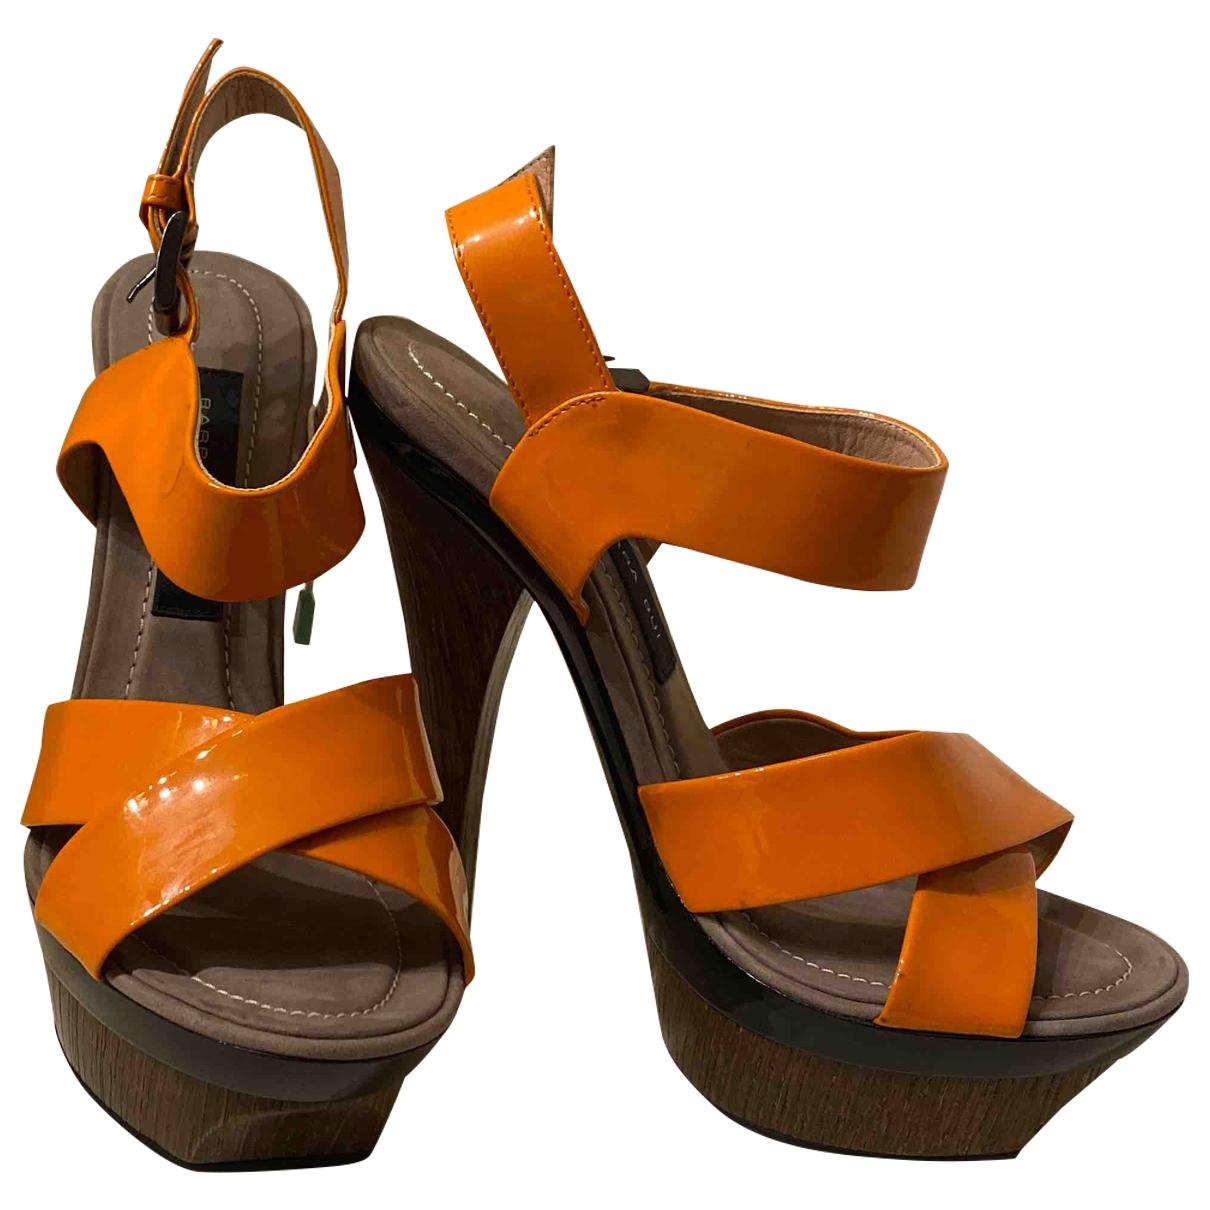 Barbara Bui \N Orange Patent leather Sandals for Women 35 EU